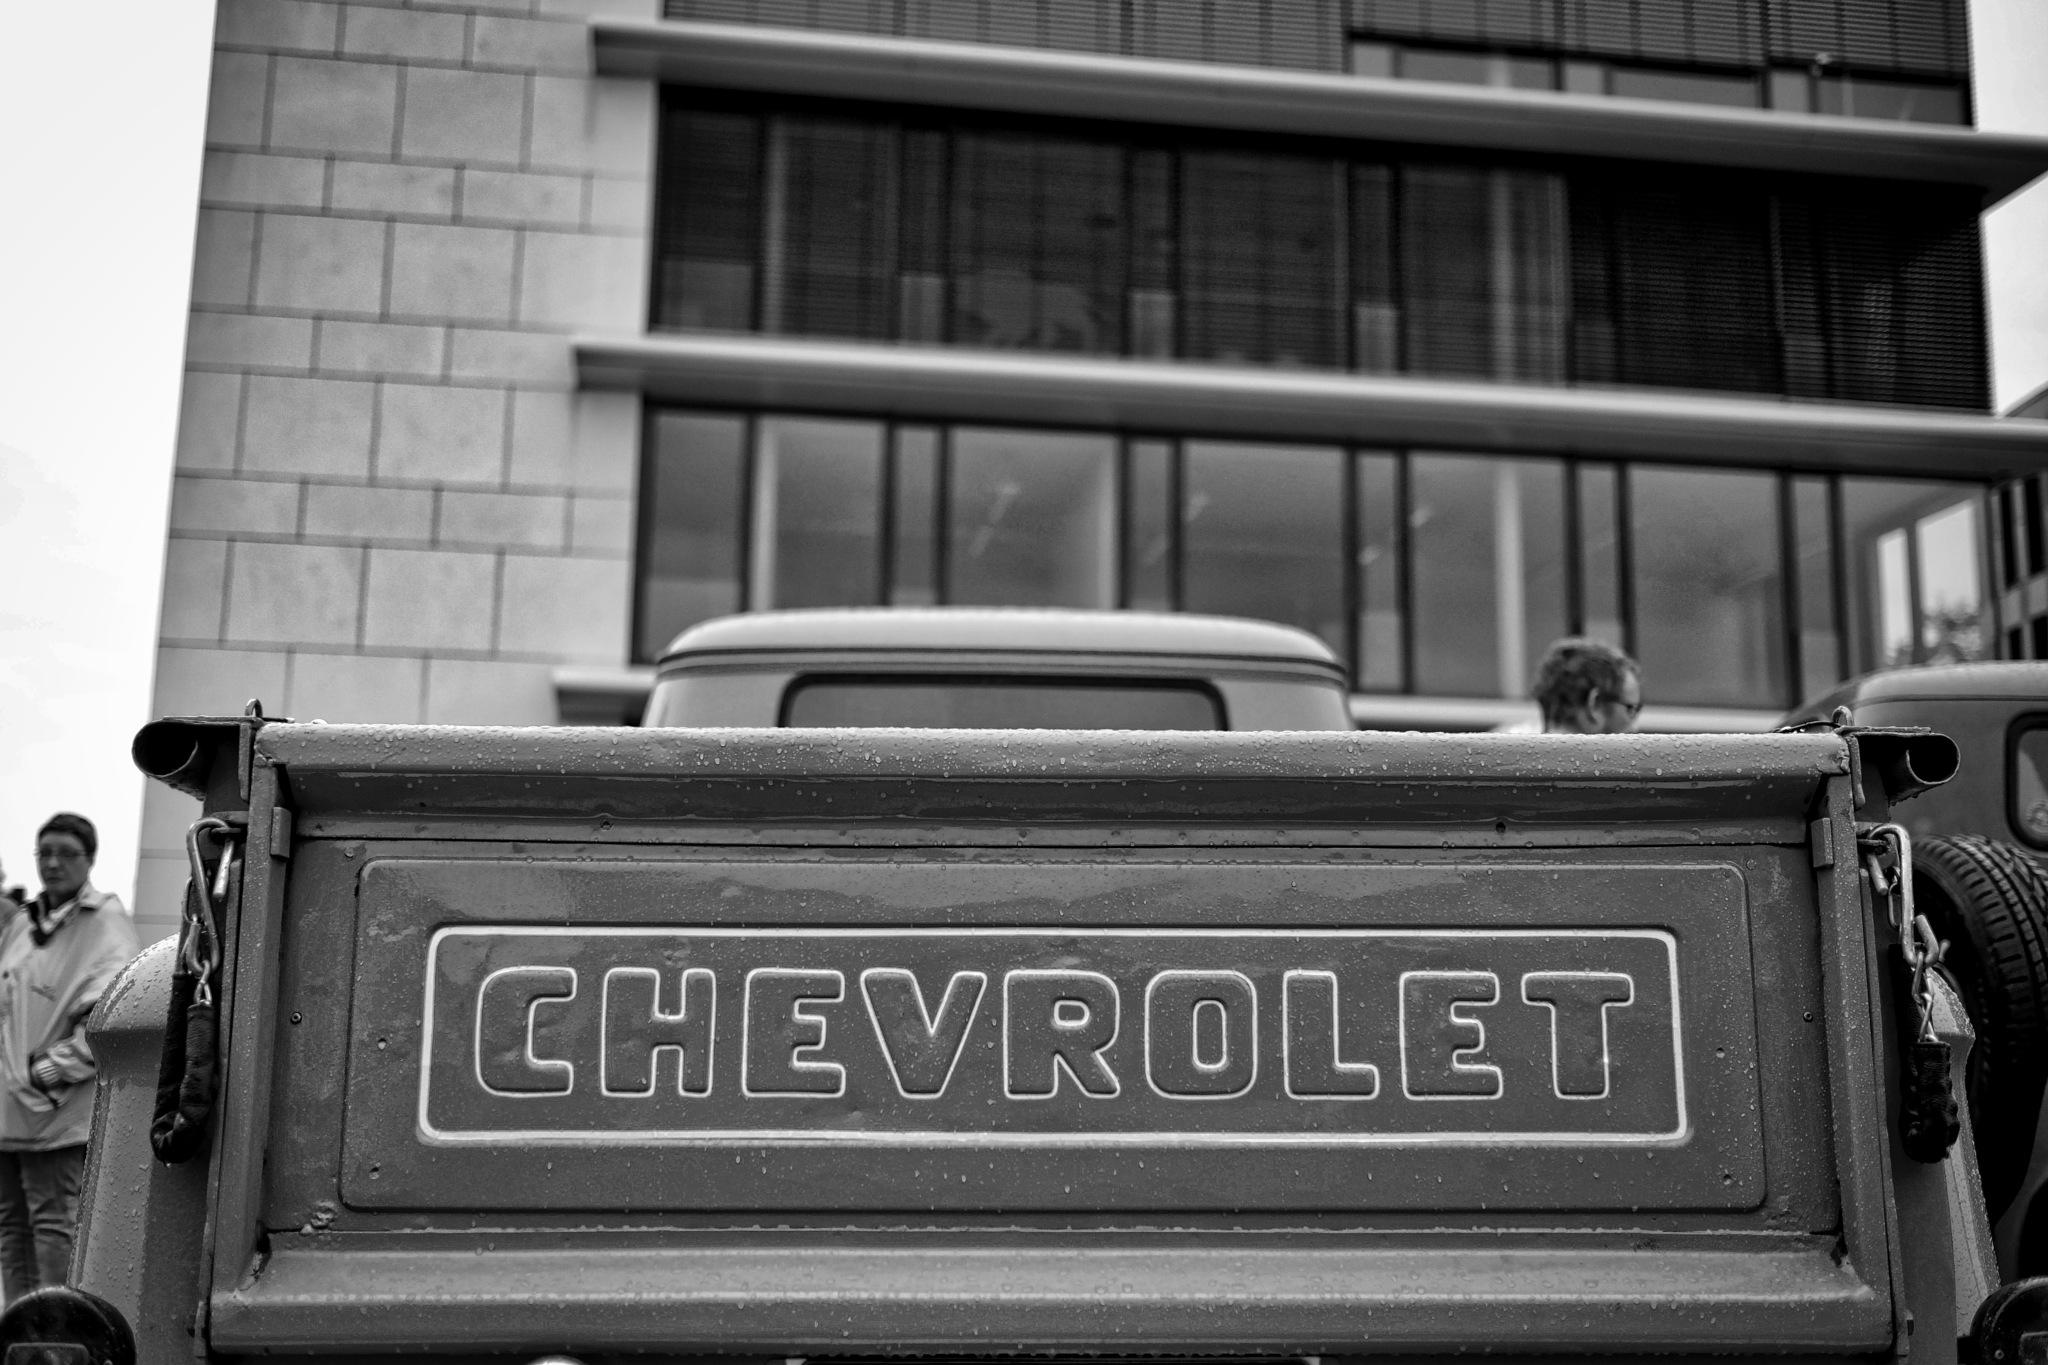 Chevrolet by peterkryzun